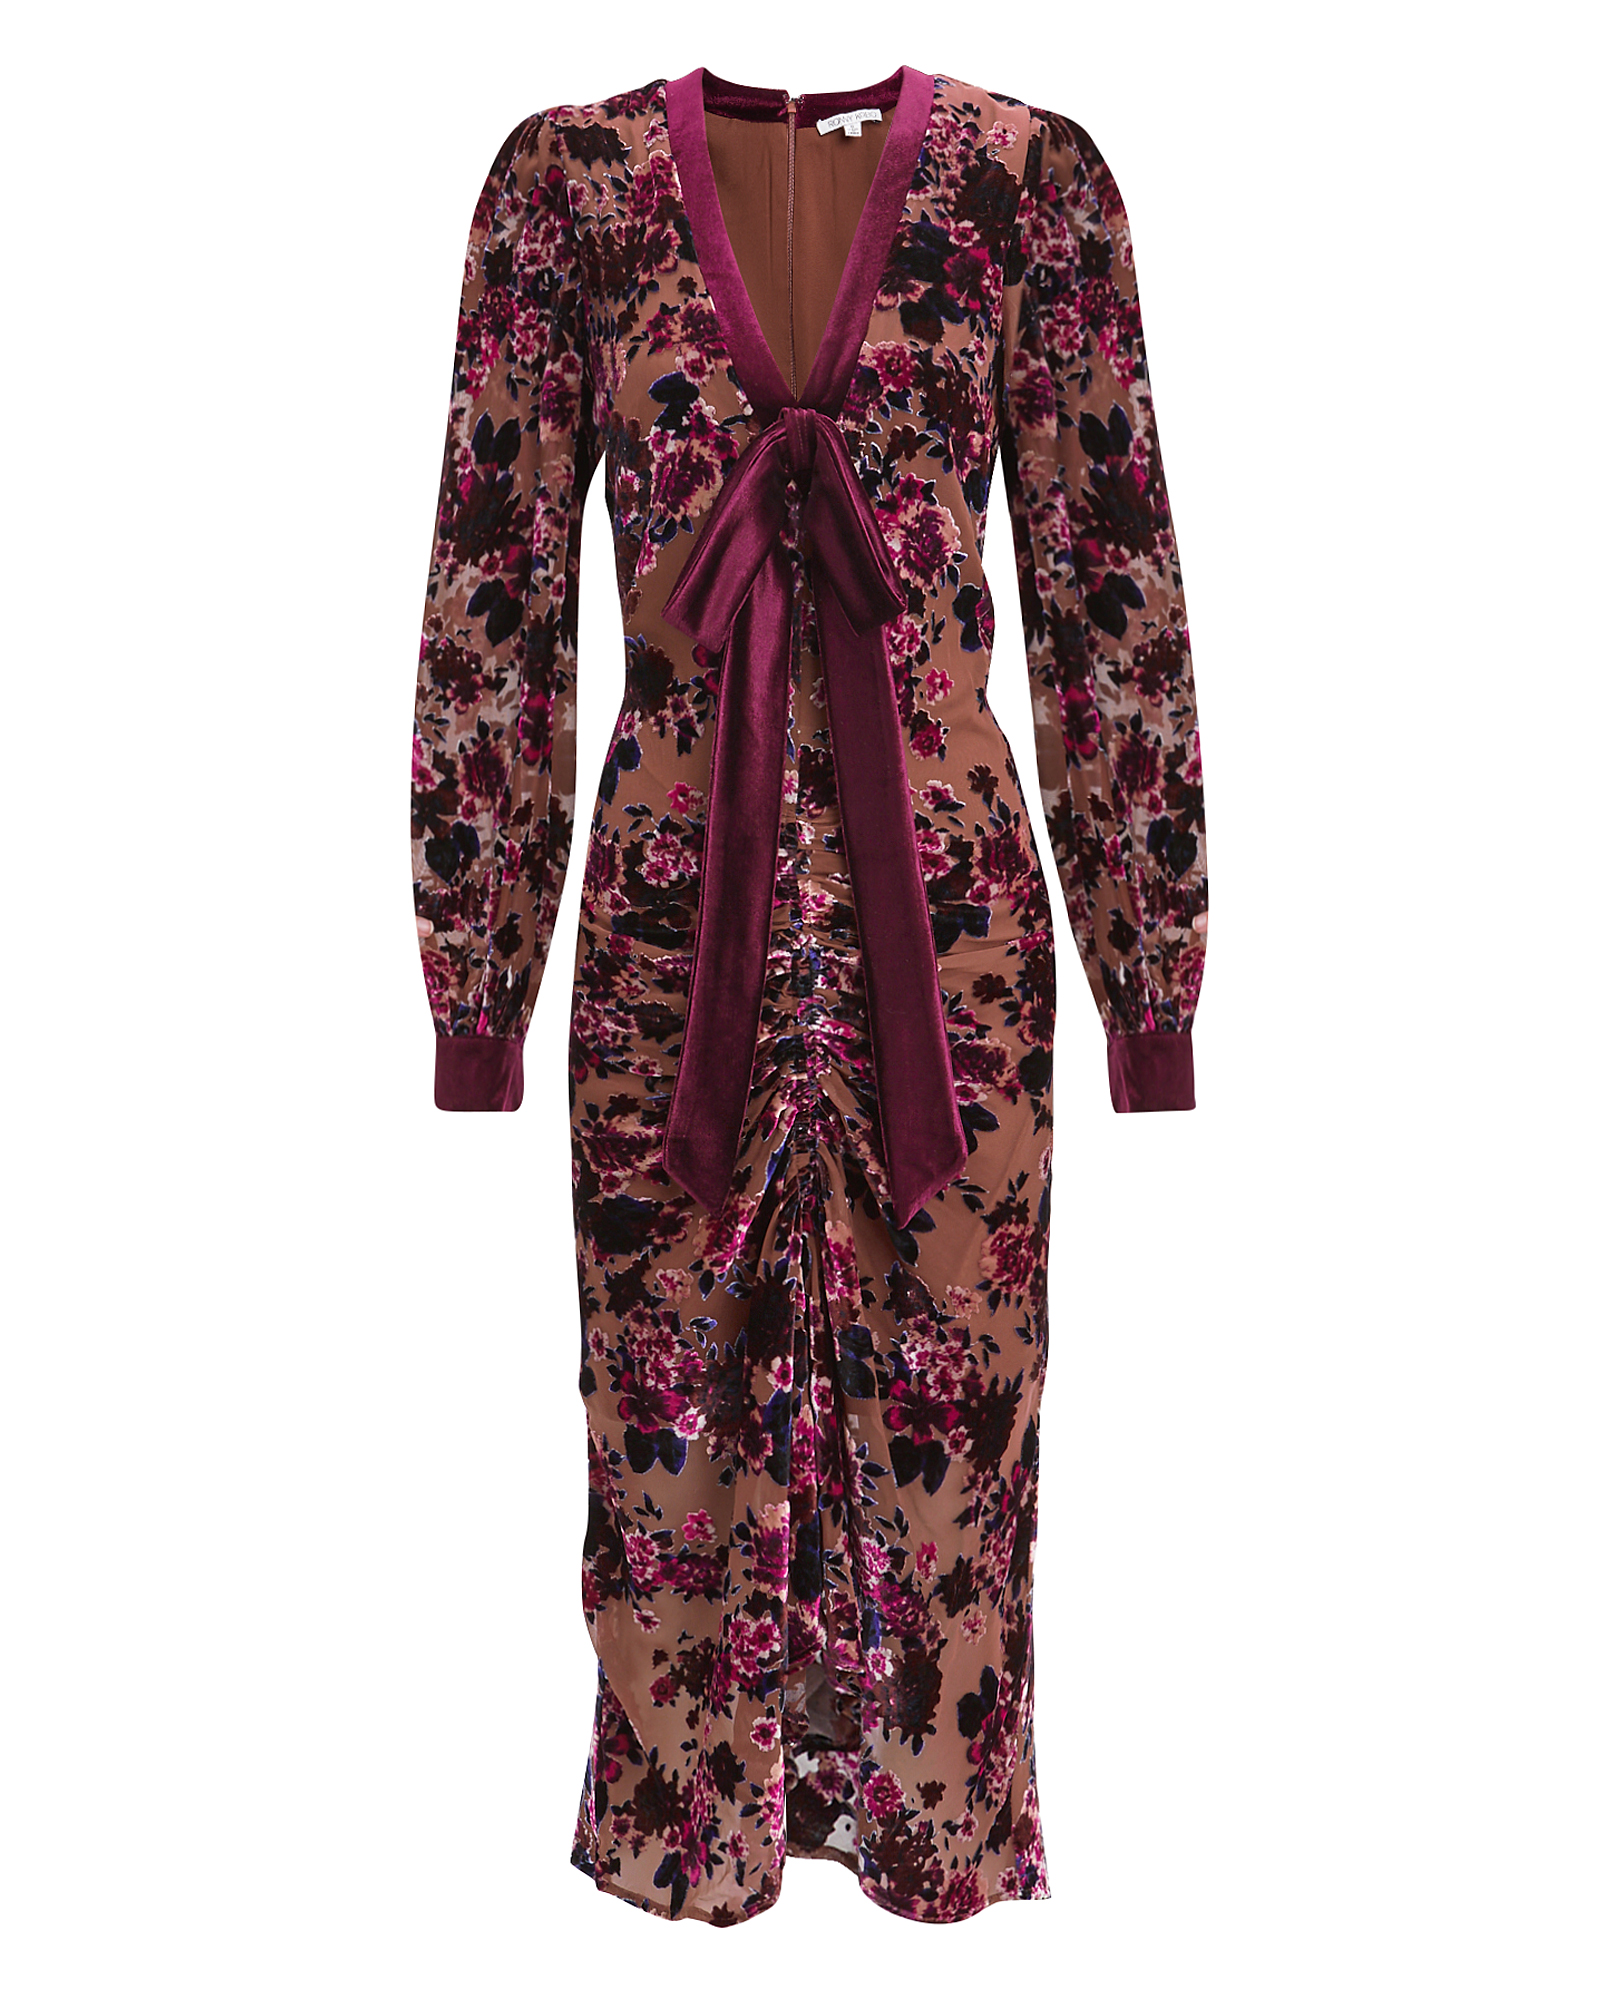 TORN Nicolette Midi Dress